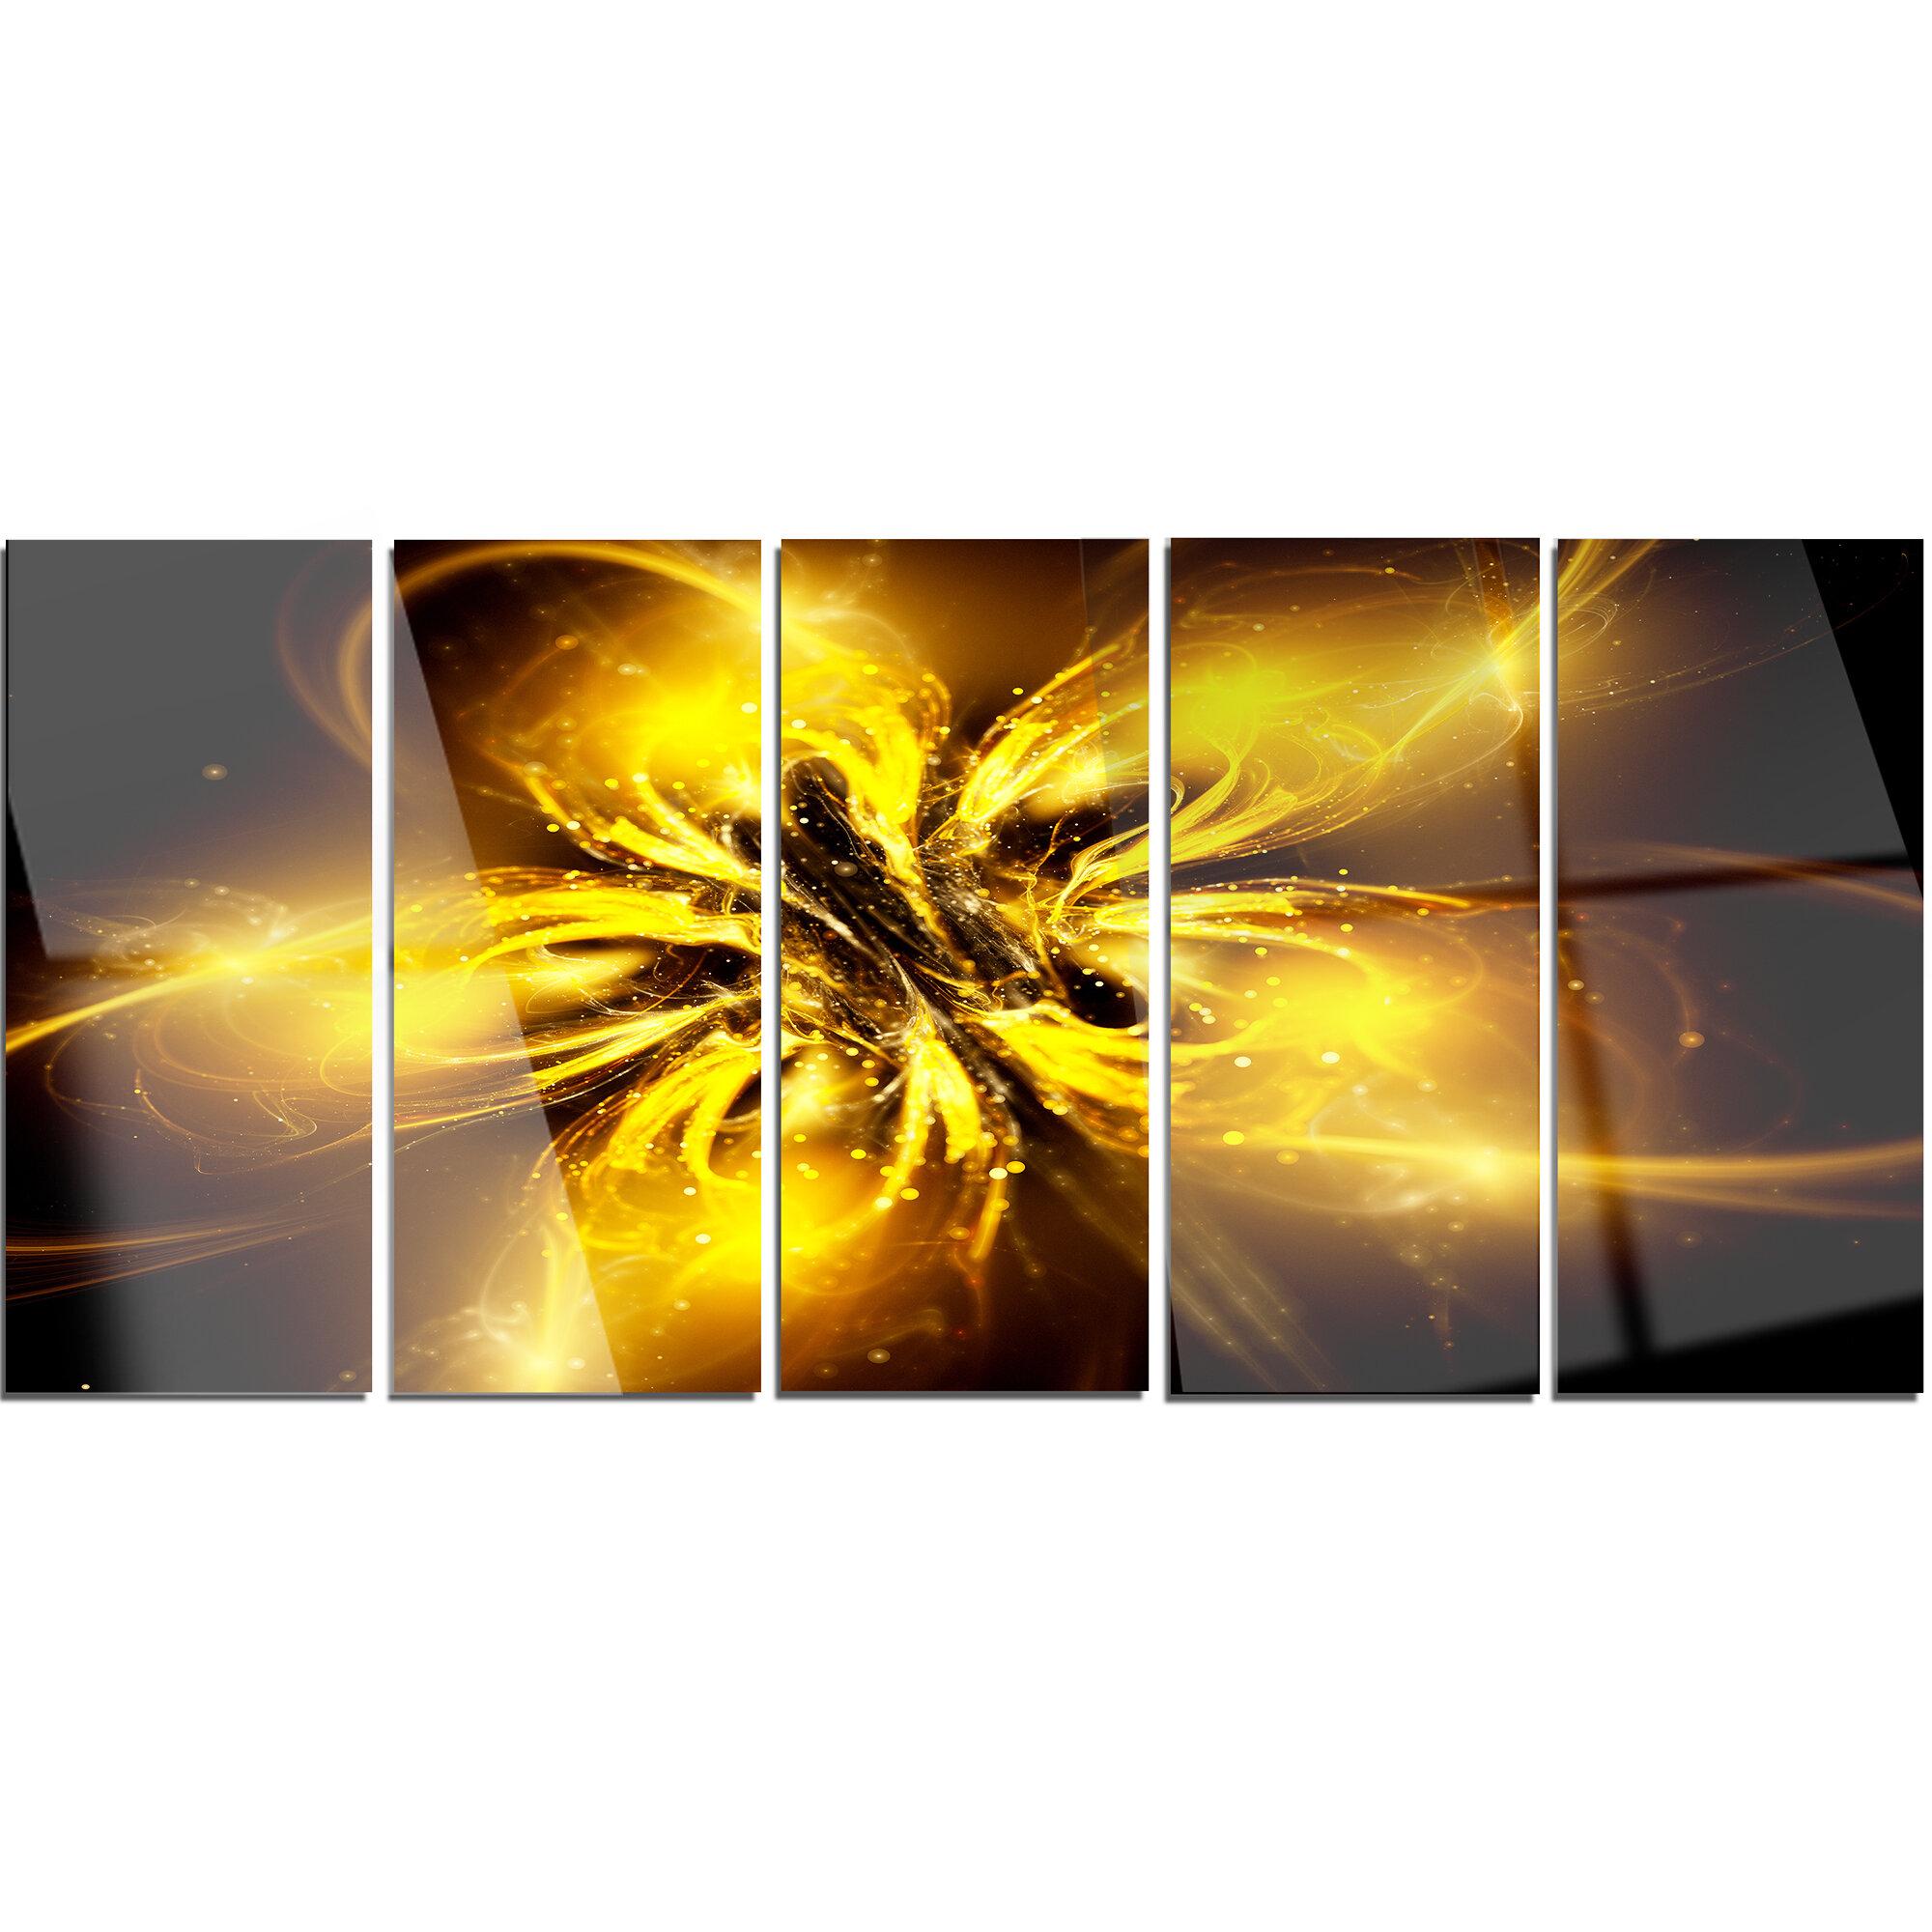 078c9337e9b7 DesignArt Shiny Gold Fractal Flower on Black  5 Piece Graphic Art on Metal  Set